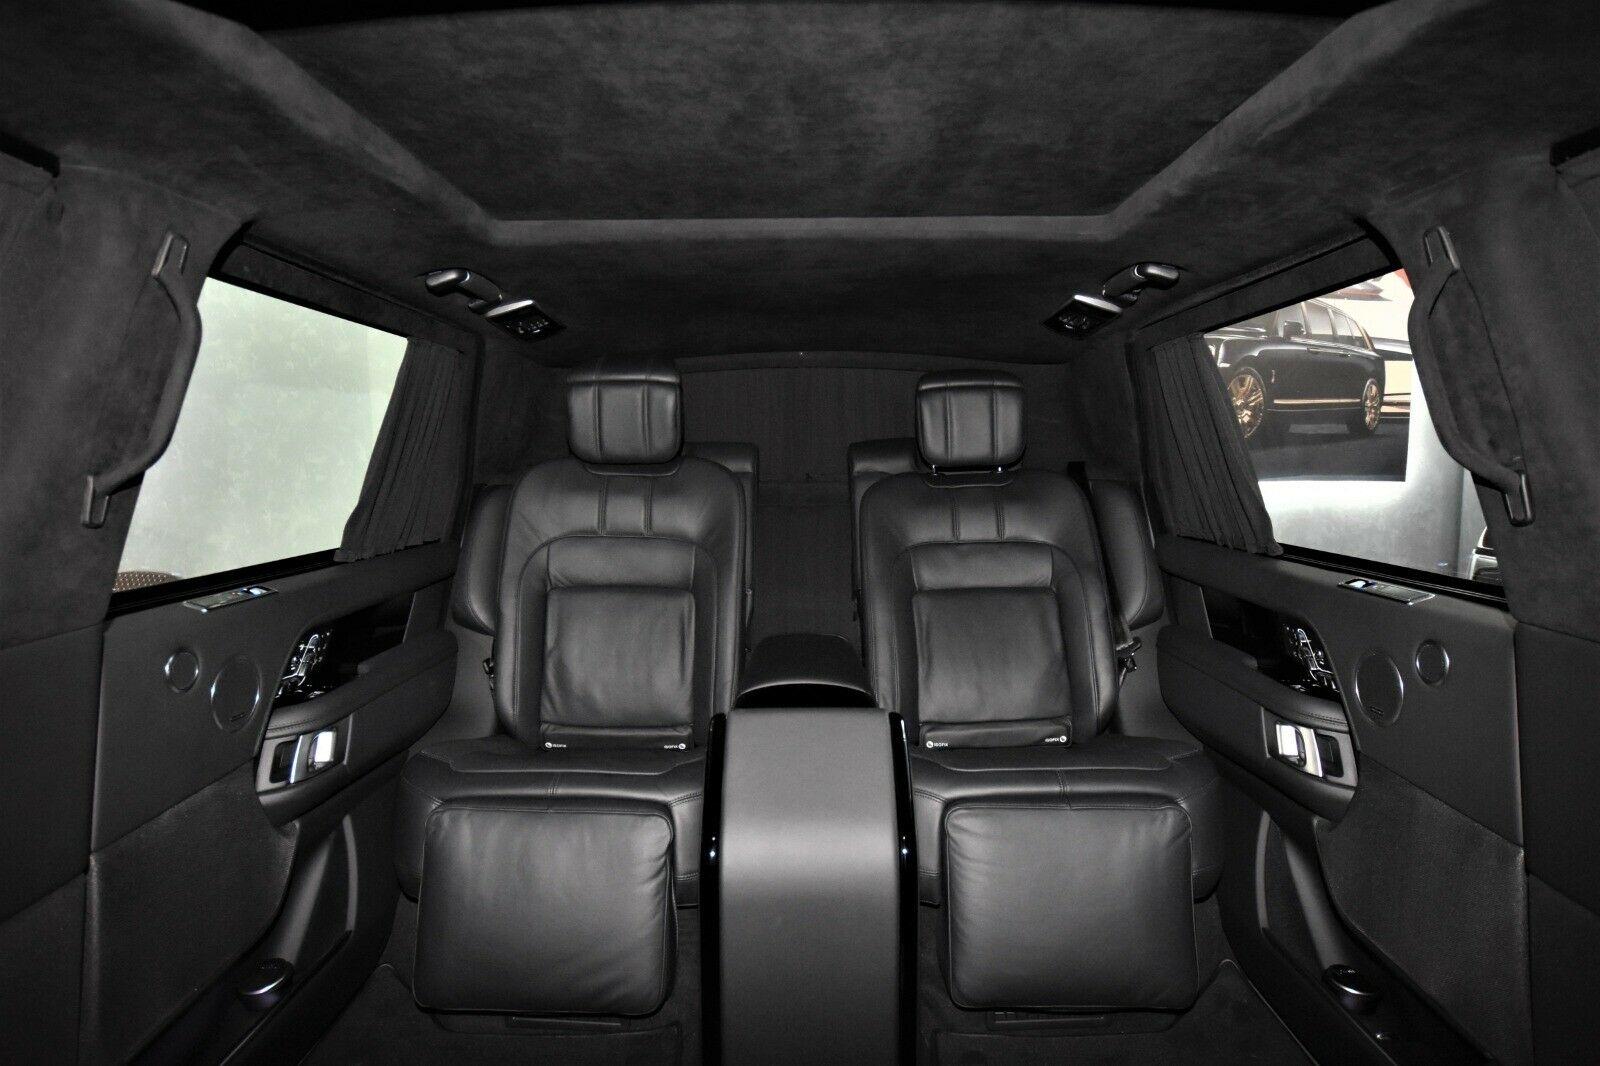 Range-Rover-SVAutobiography-by-Klassen-22